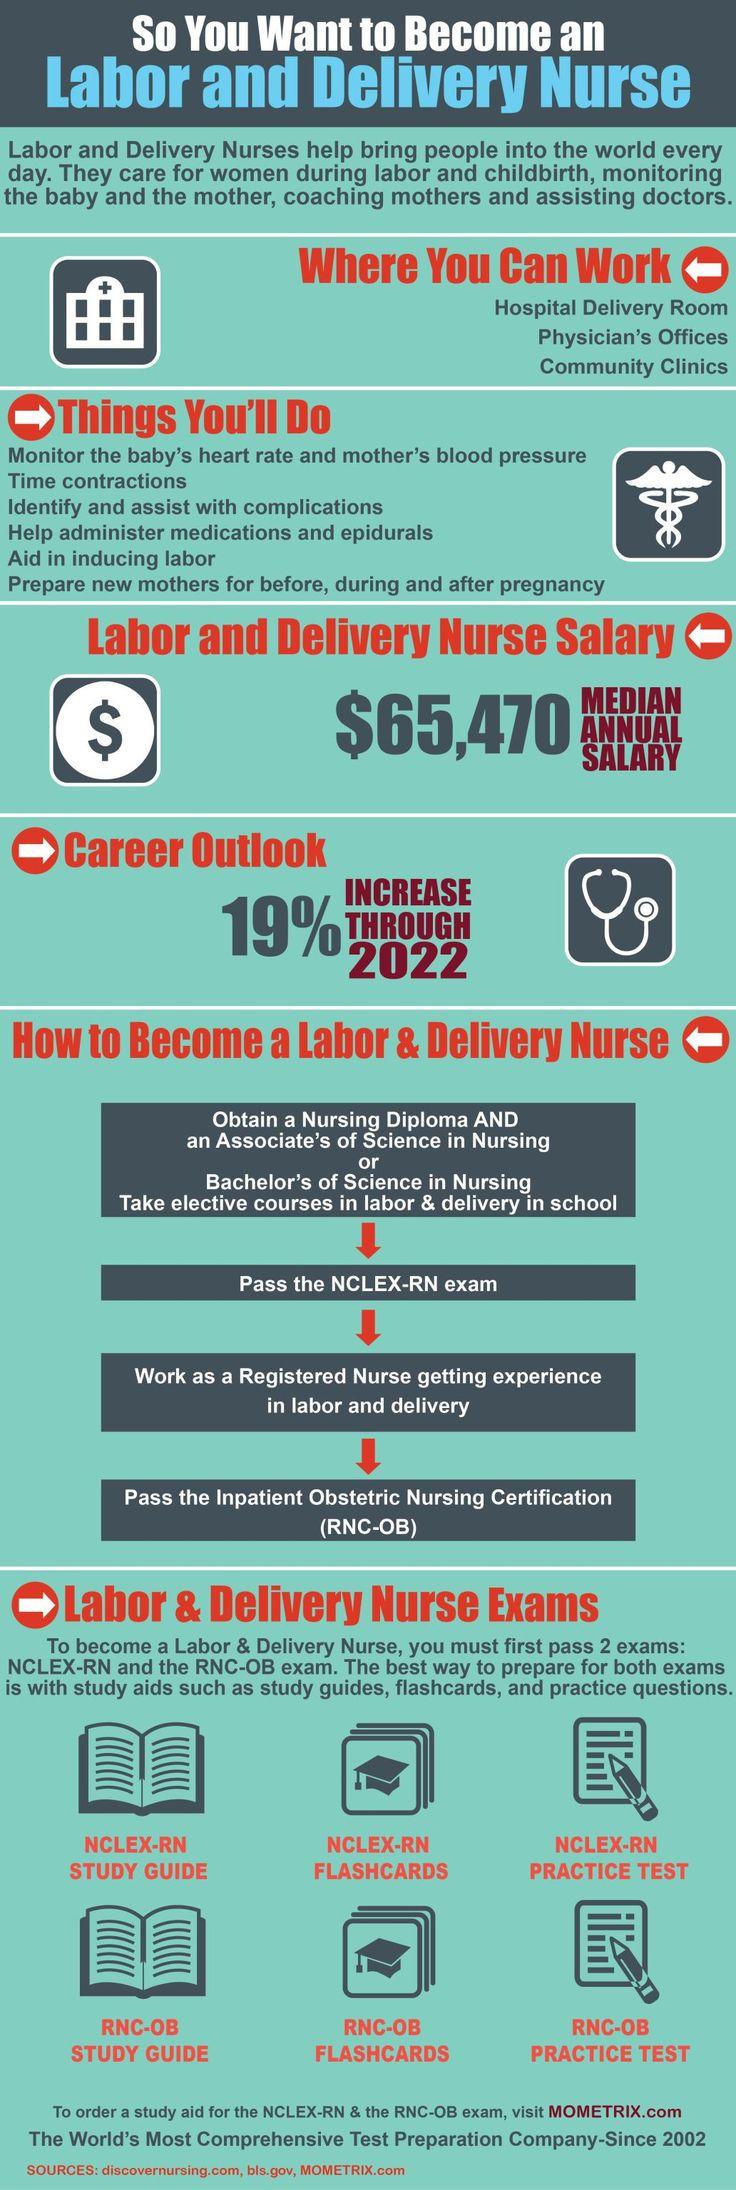 Labor and Delivery Nurse